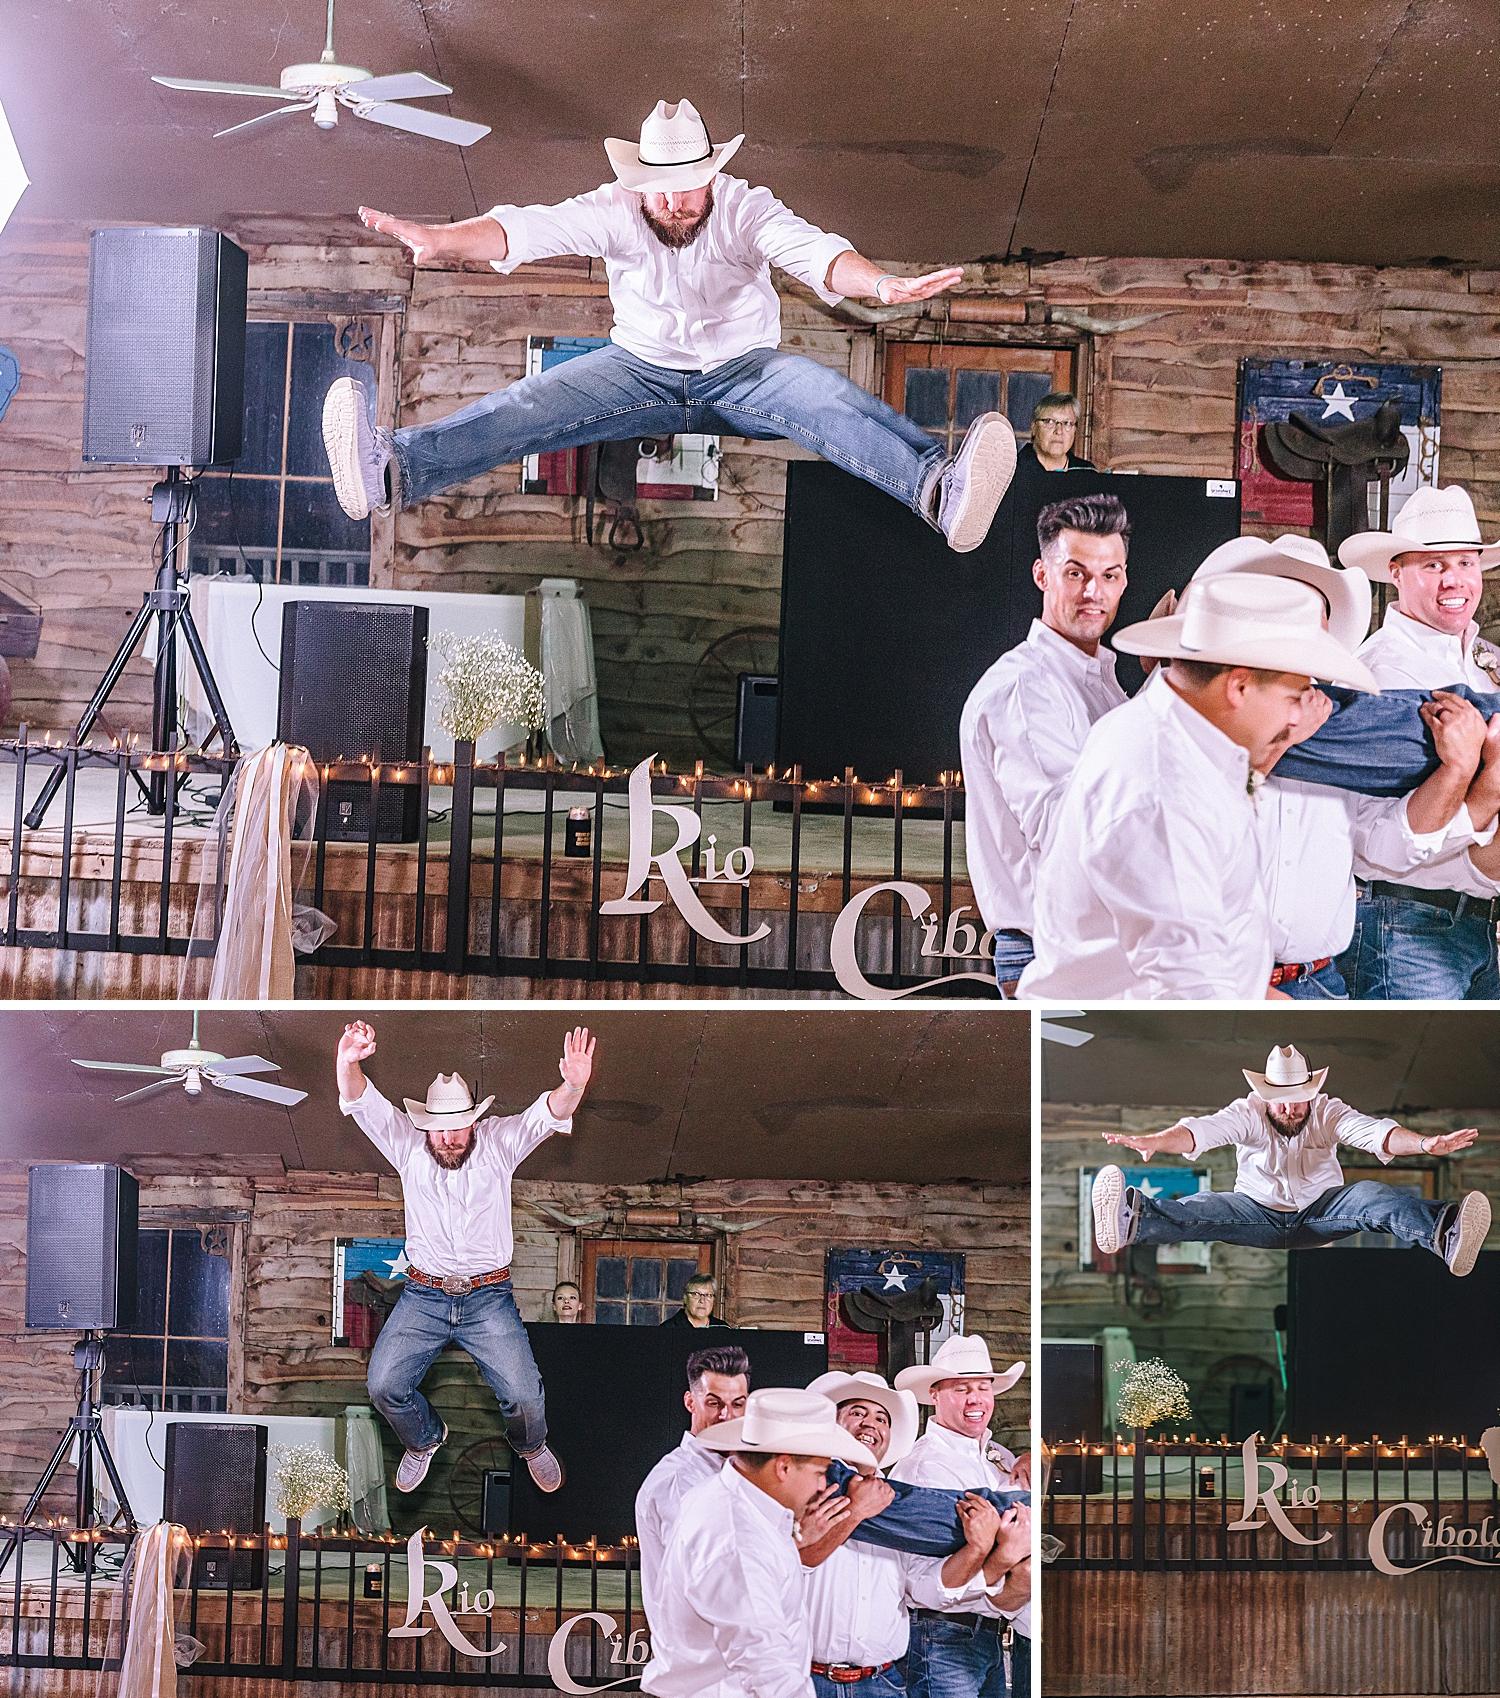 Rio-Cibilo-Ranch-Marion-Texas-Wedding-Rustic-Blush-Rose-Quartz-Details-Carly-Barton-Photography_0089.jpg